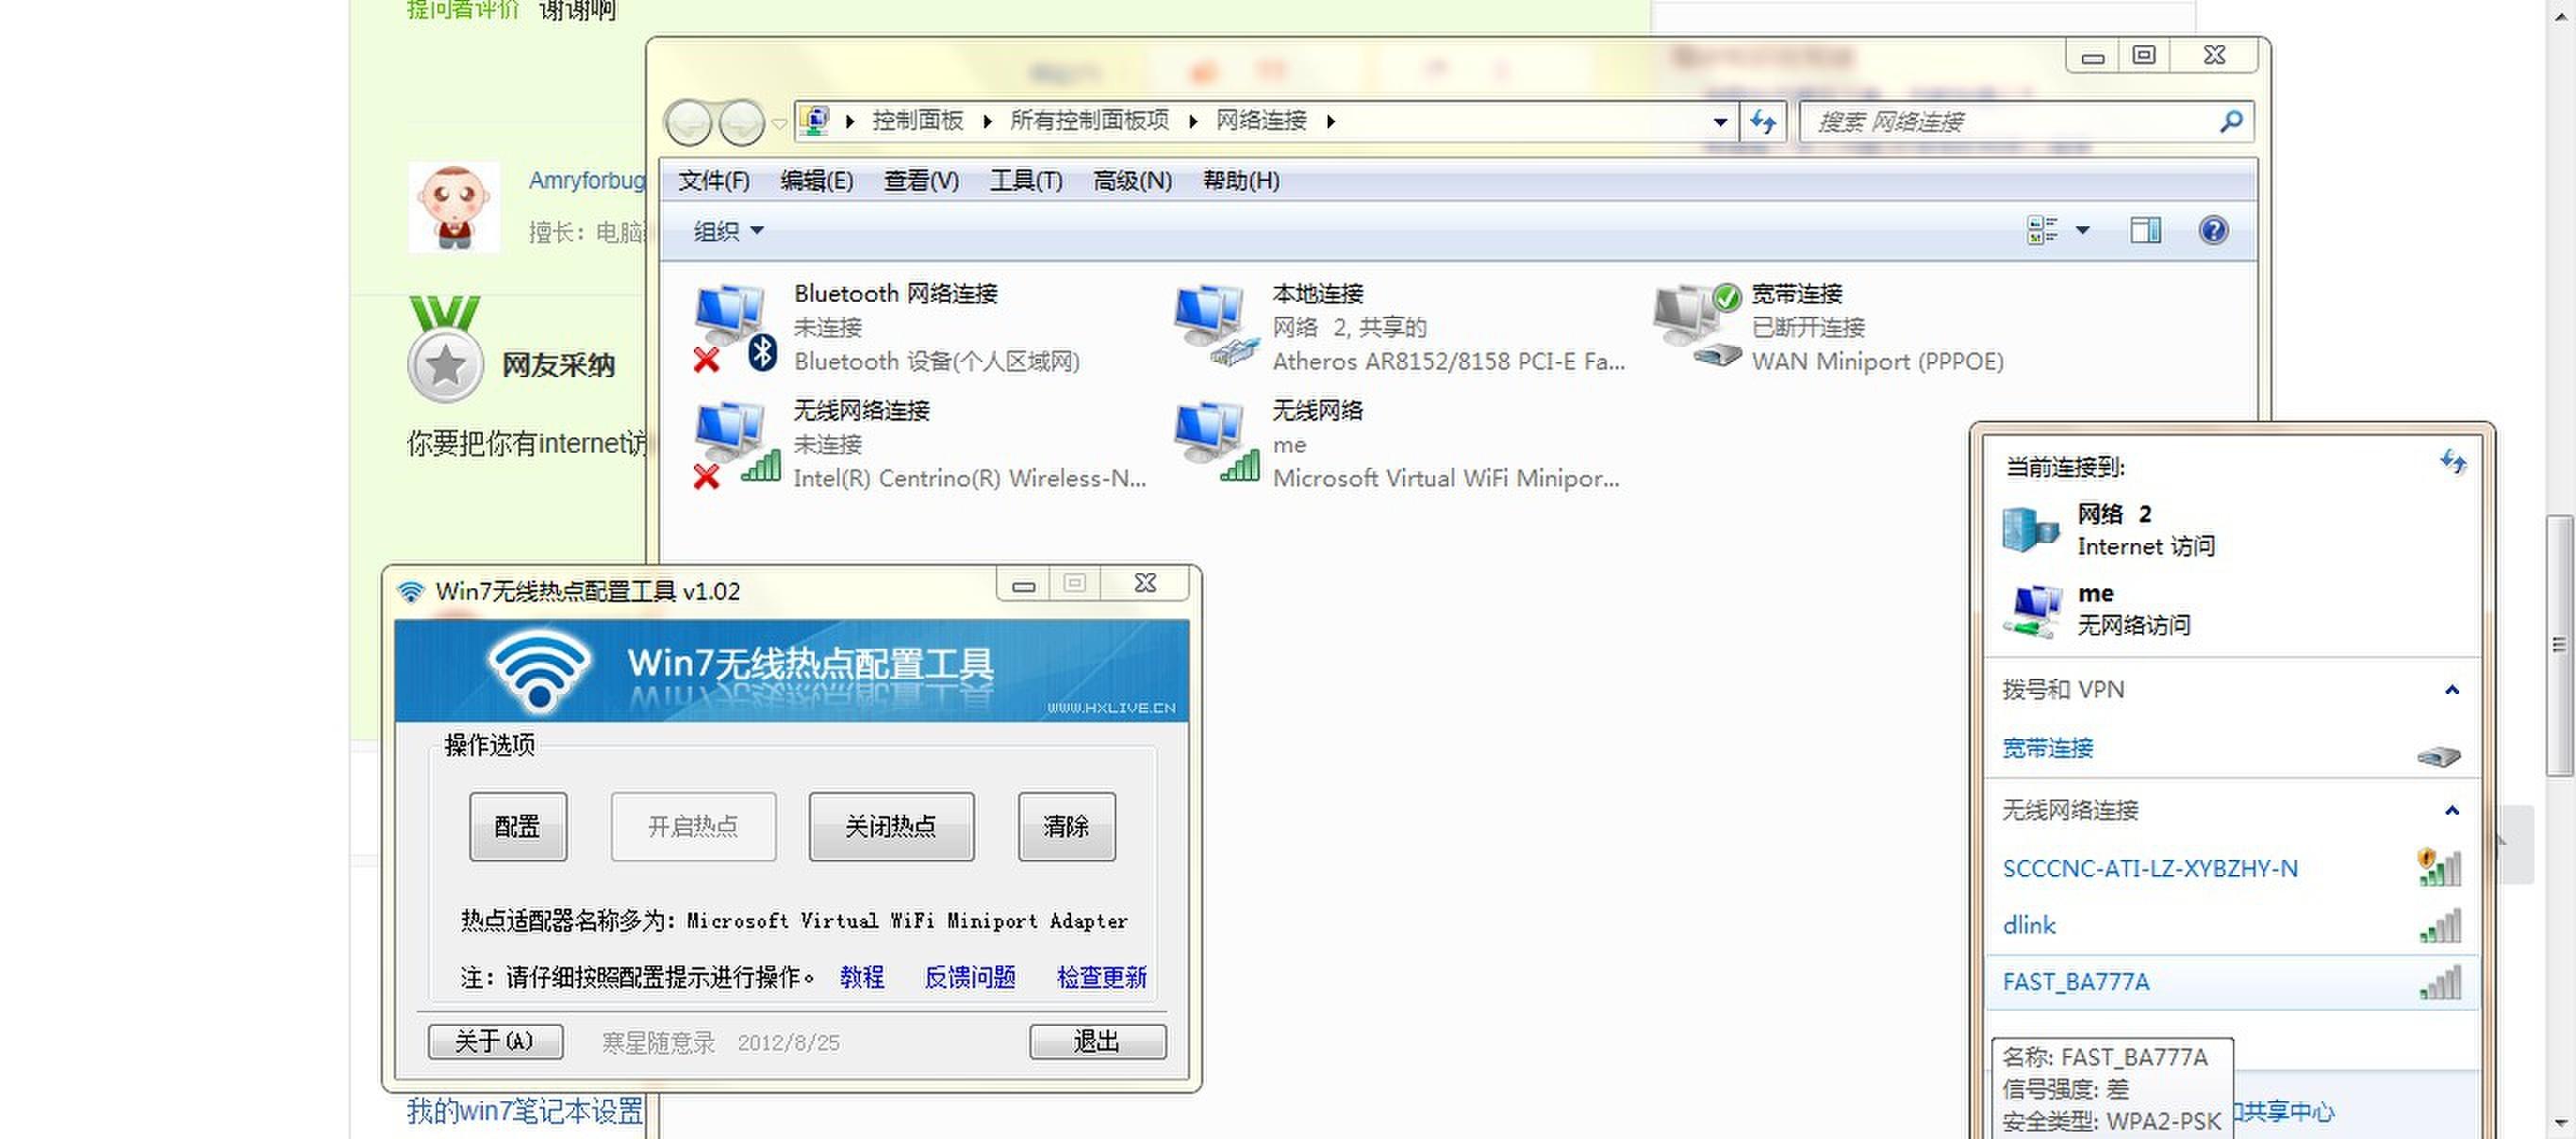 win7无线热点已经建立连接,网络也共享了,但是还是显示无internet访问图片